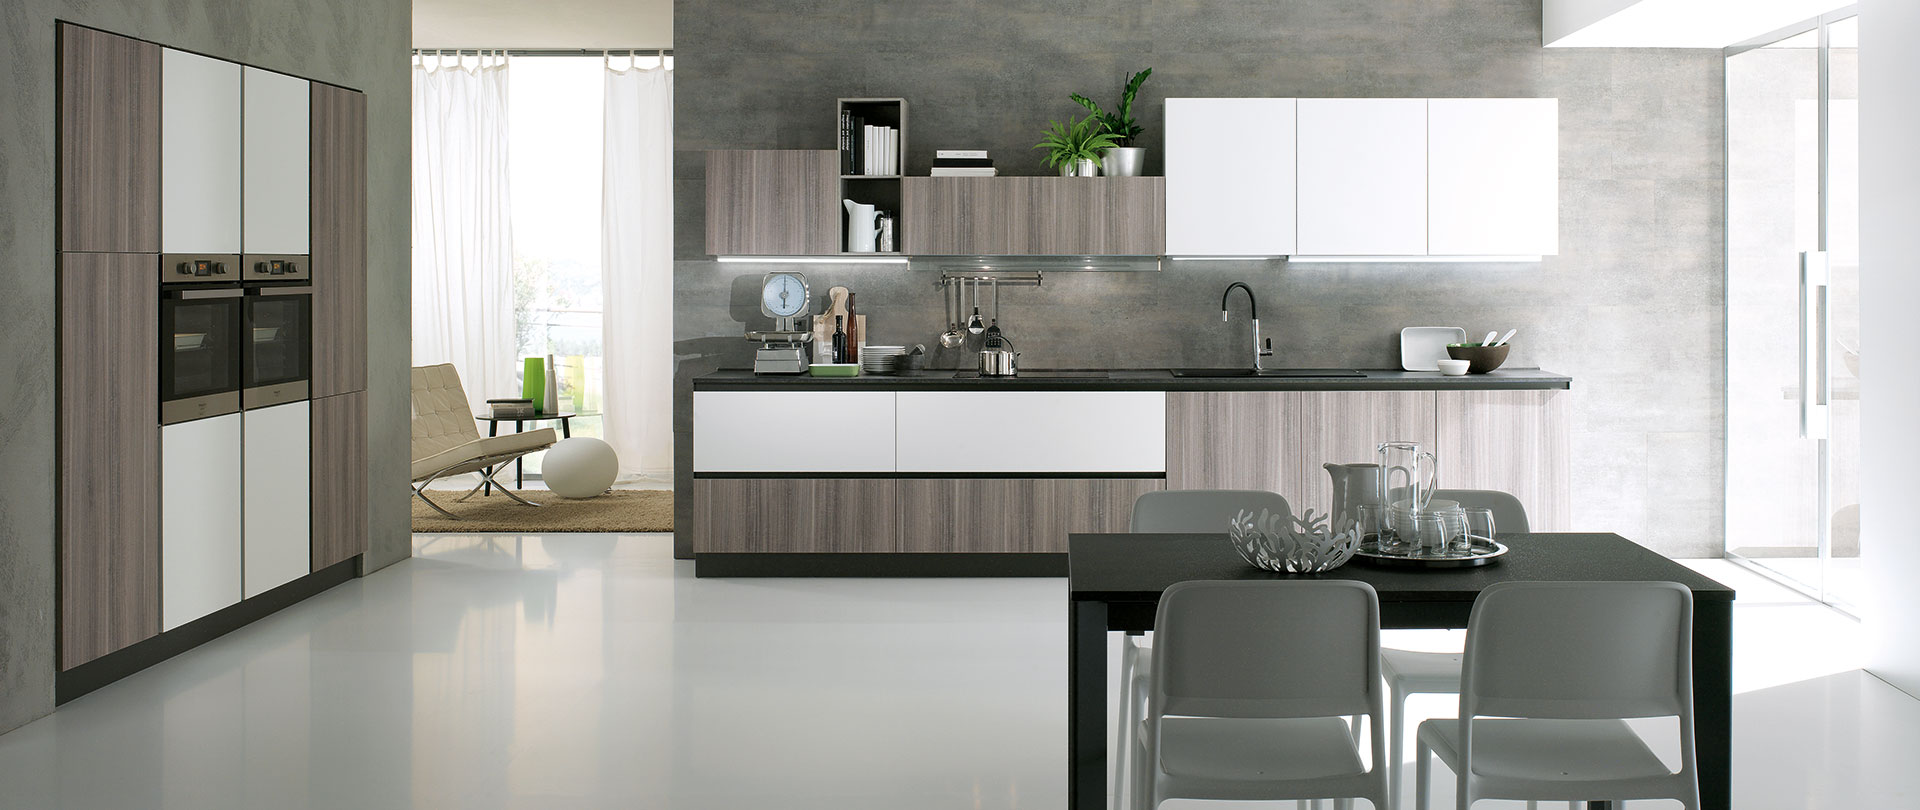 Cucina agor evo cucine - Cucina bianco opaco ...